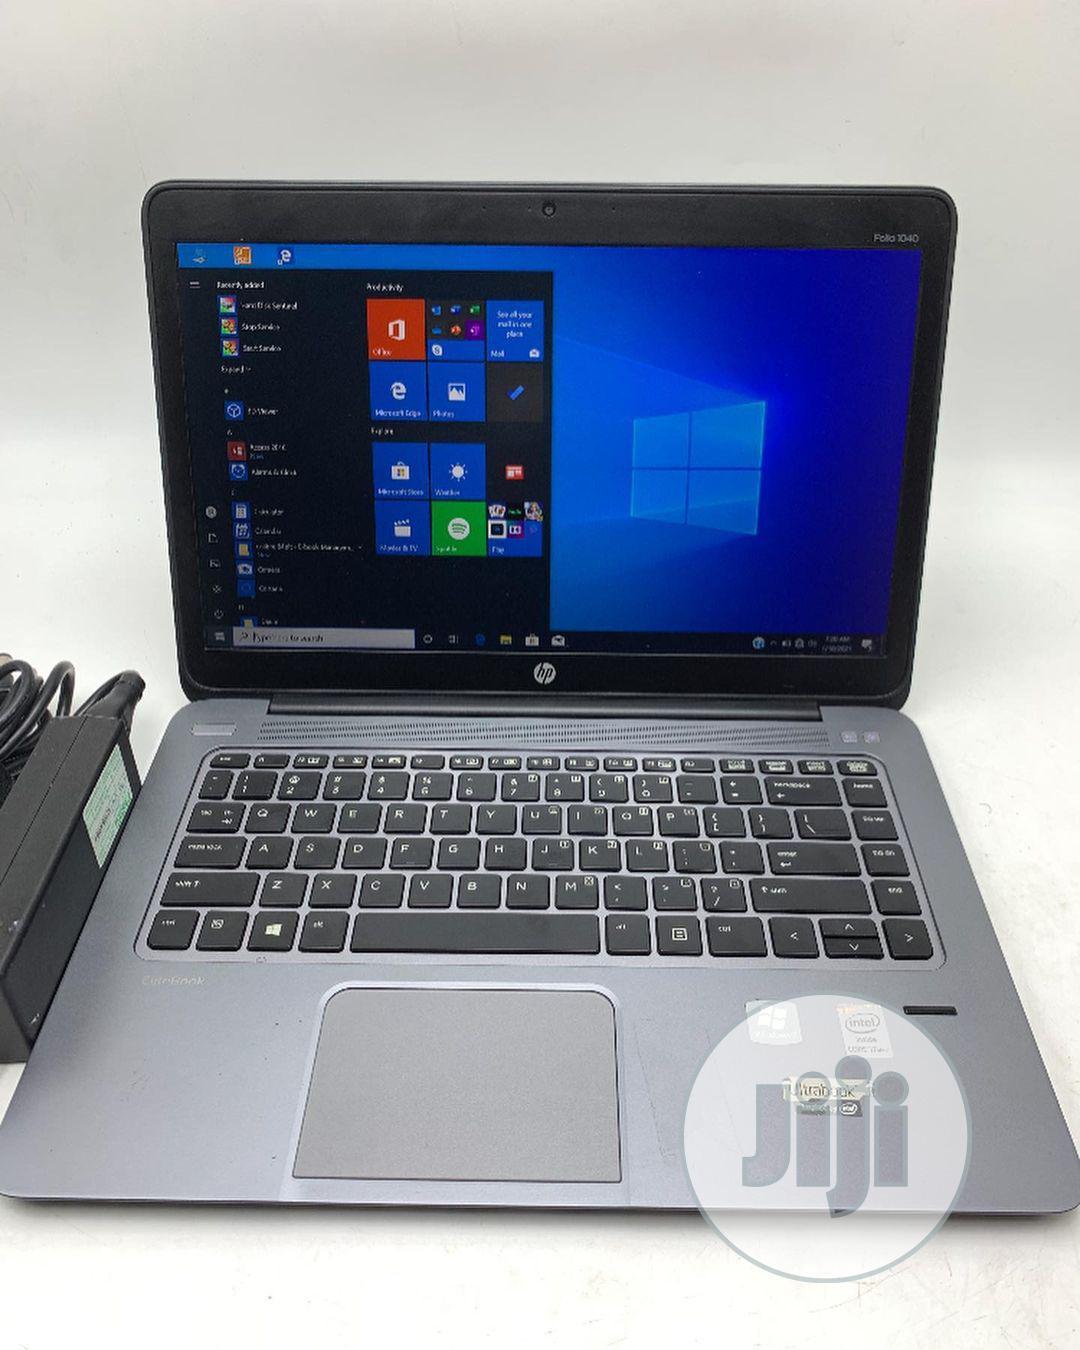 Laptop HP EliteBook Folio 1040 G2 8GB Intel Core I7 SSD 256GB